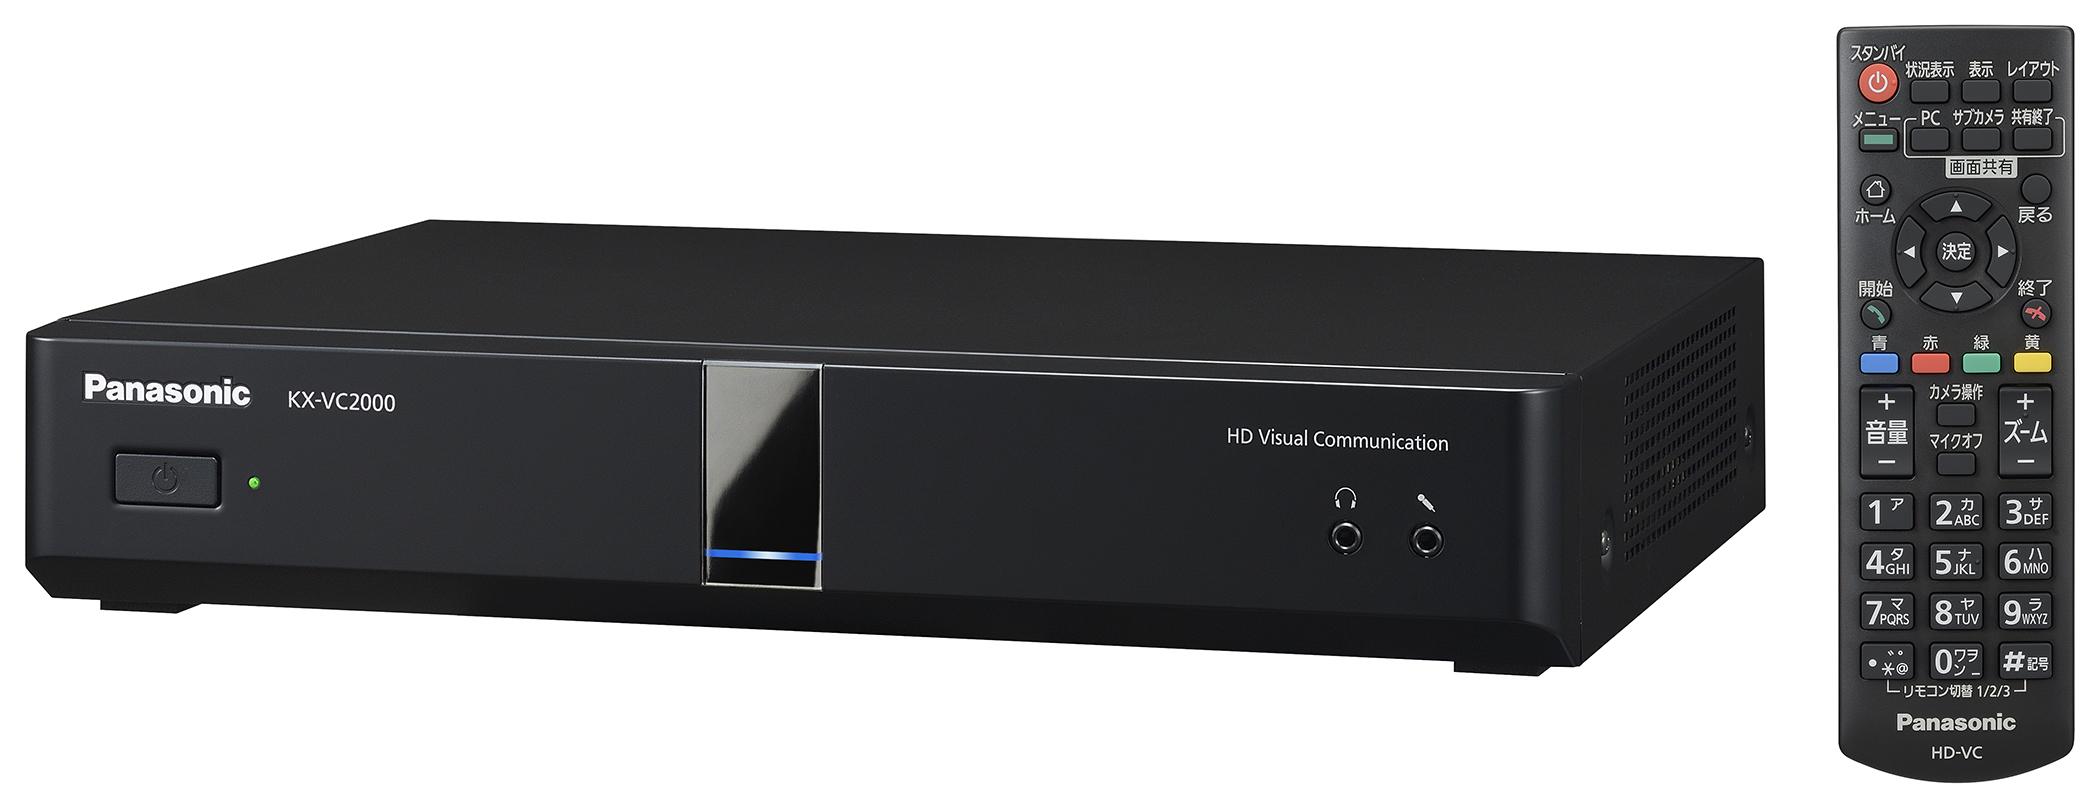 KX-VC2000J 高解像度用JPG